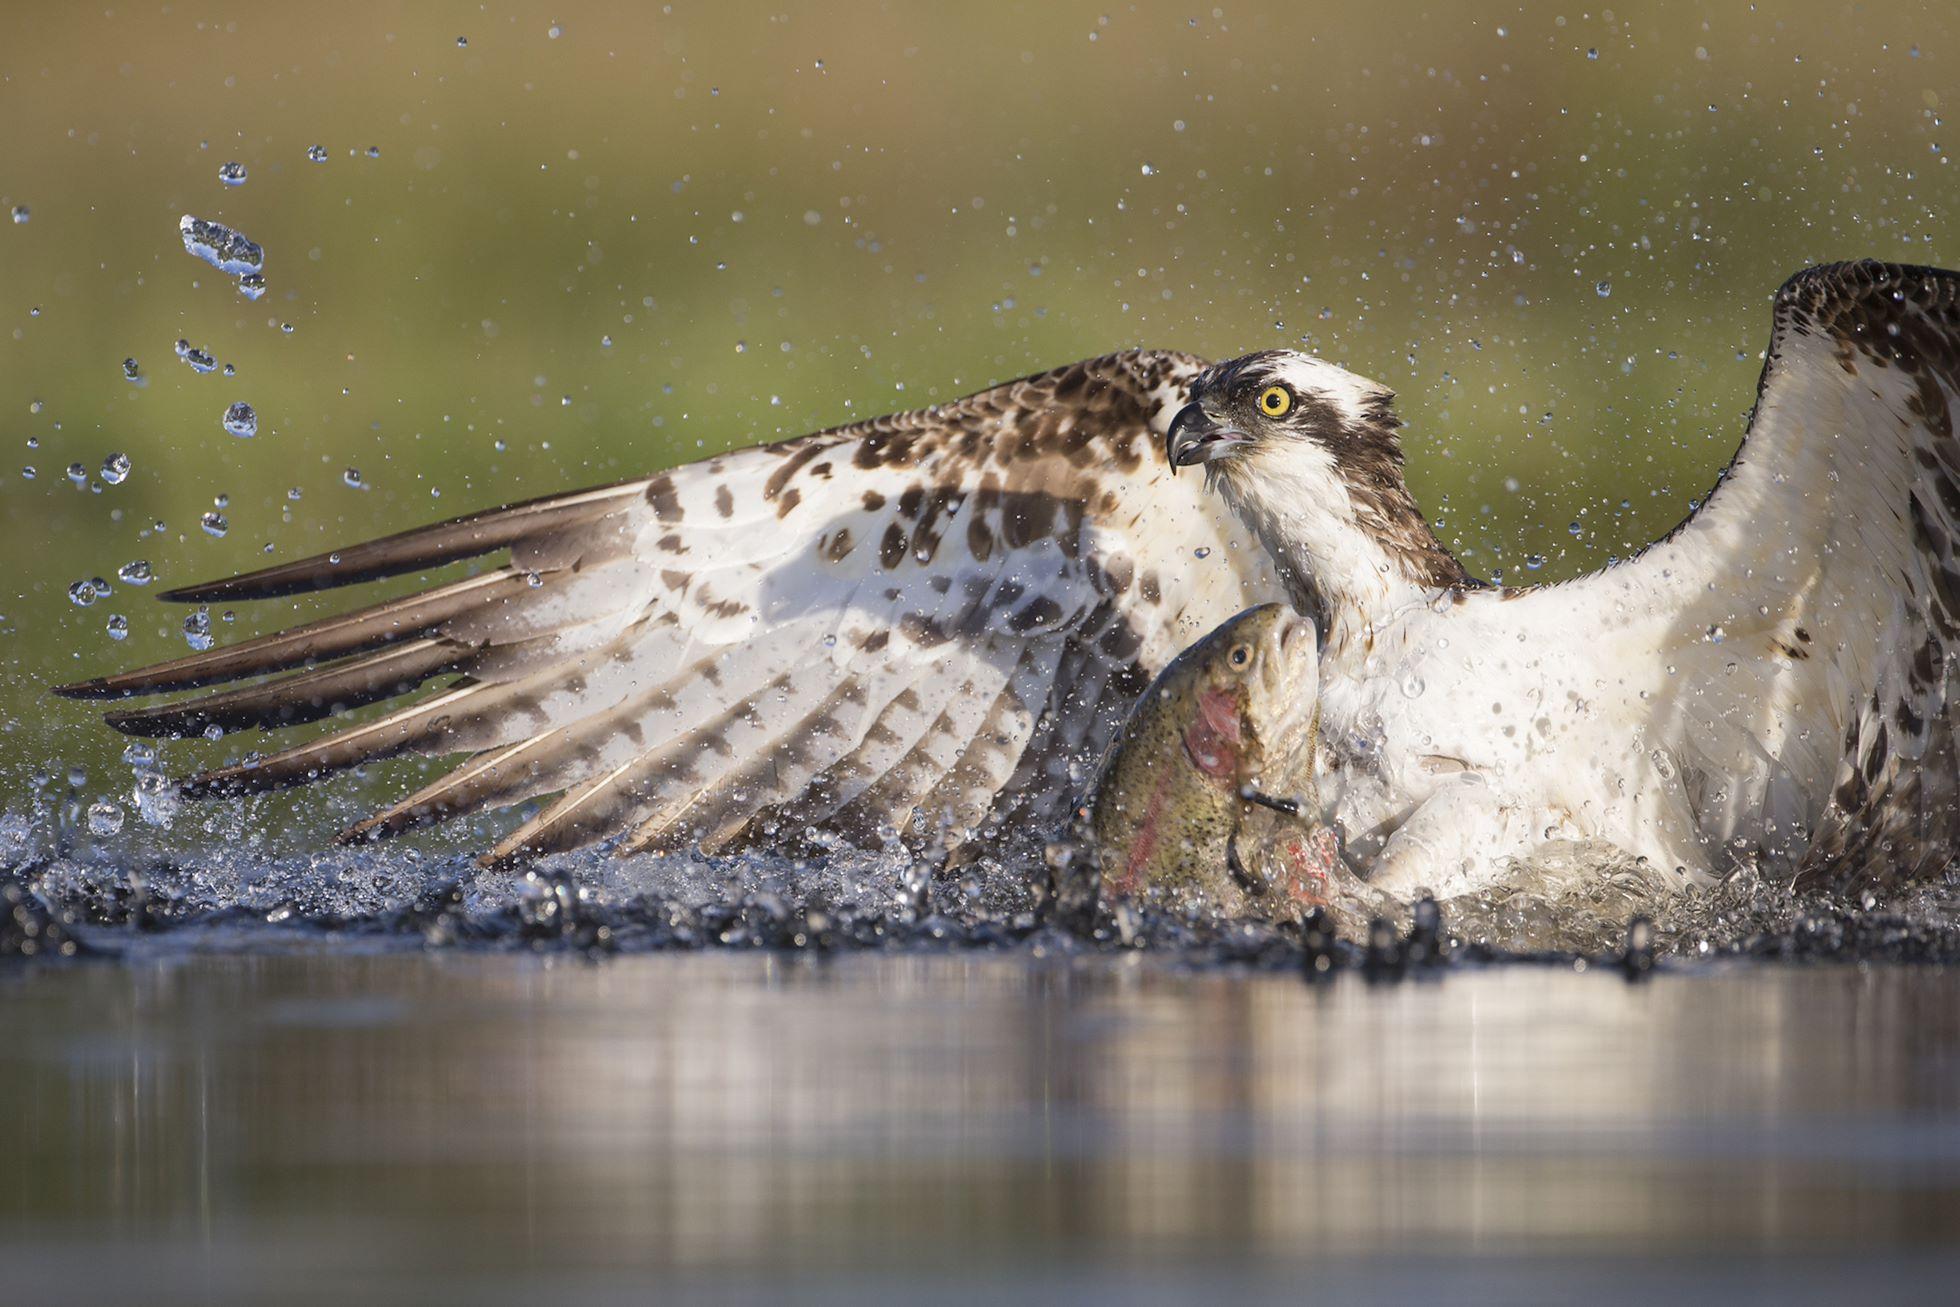 Osprey (Pandion haliaetus) fishing at dawn, Cairngorms National Park, Scotland.